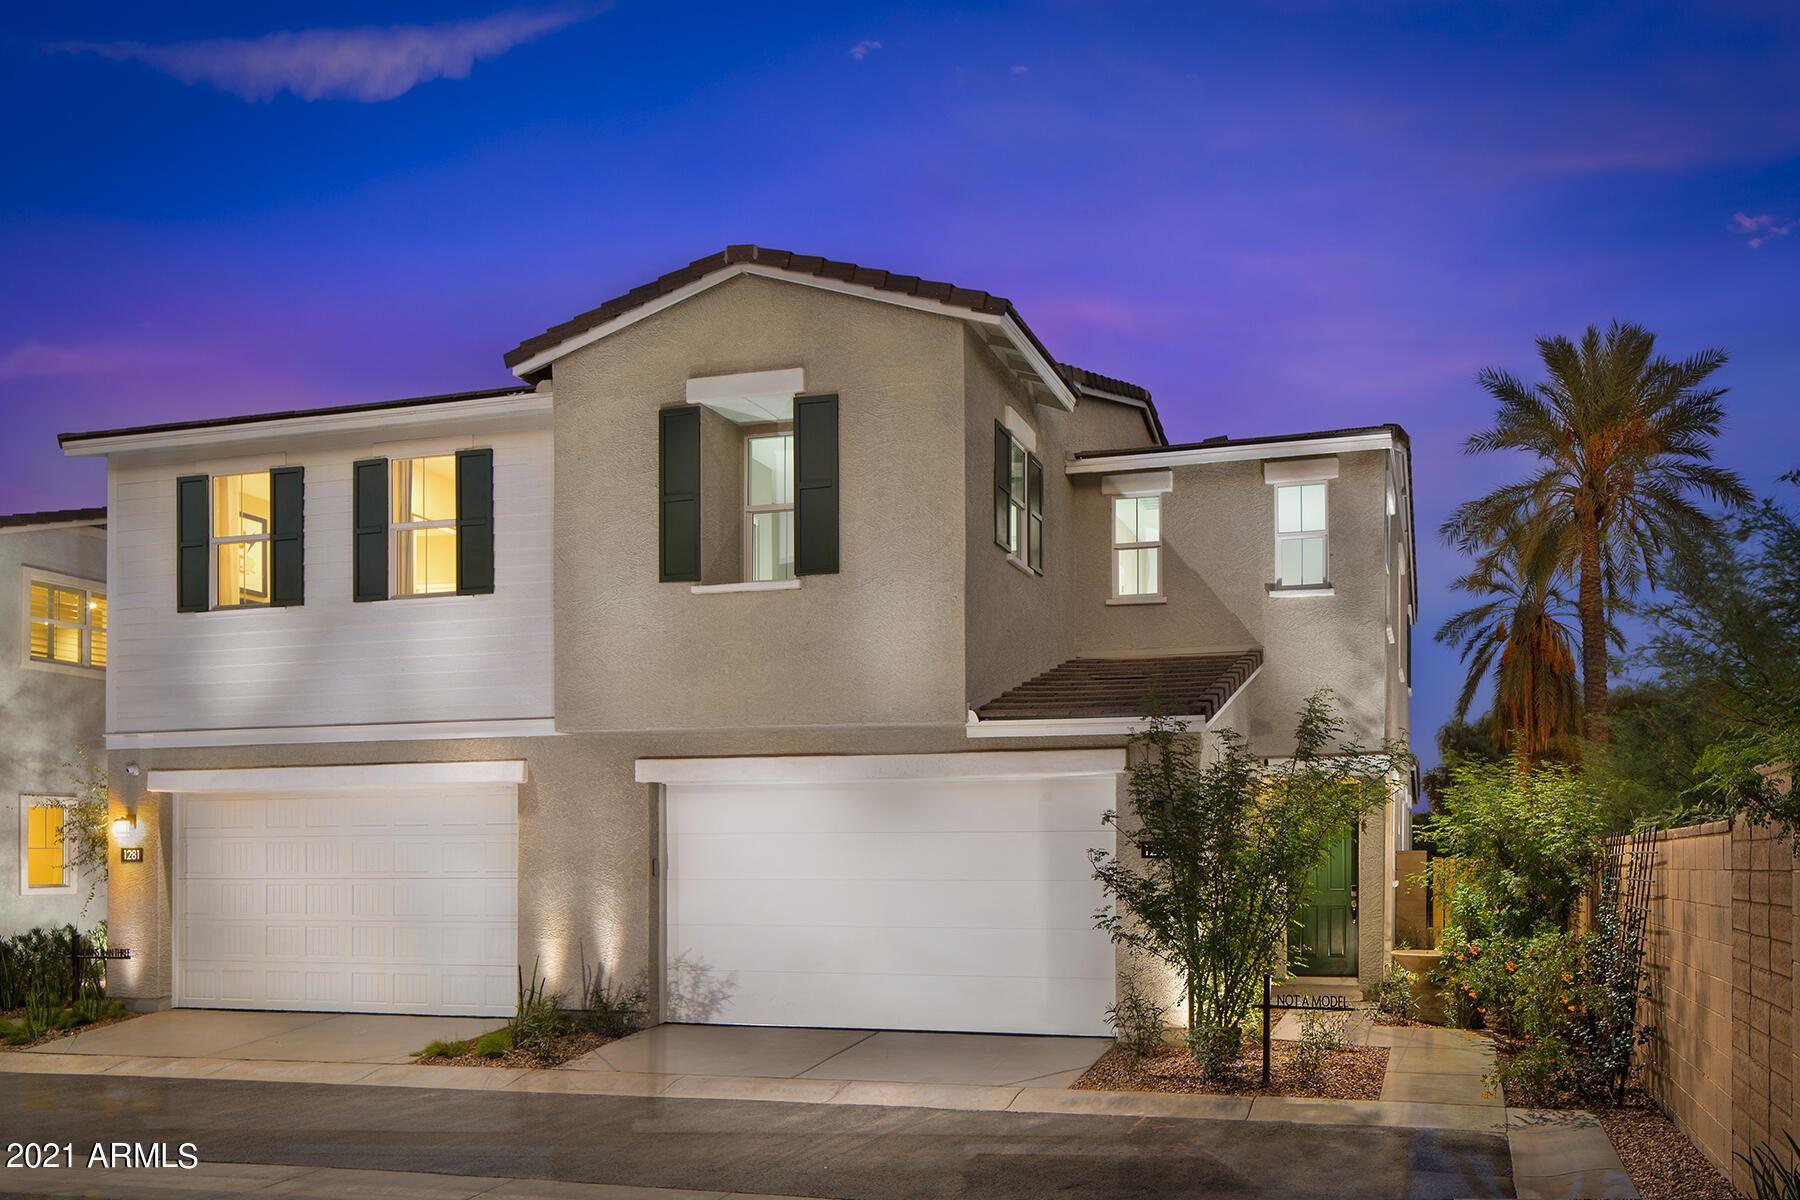 Photo of 2759 S JACKRABBIT Drive, Chandler, AZ 85286 (MLS # 6230902)